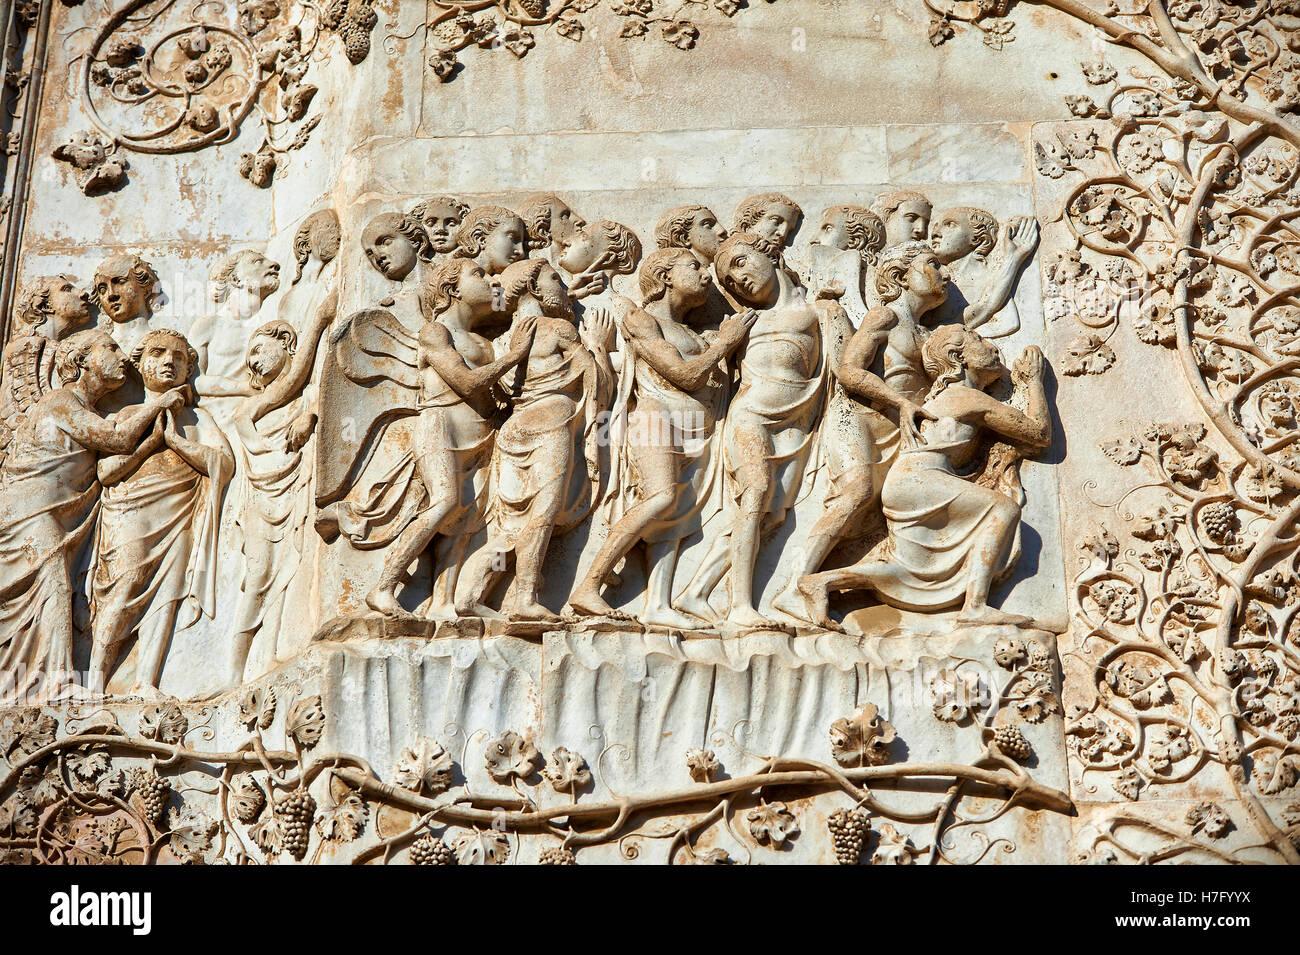 Bajorrelieve de la última sentencia Maitani, circa1310, Toscana, con fachada gótica catedral Duomo Orvieto, Imagen De Stock